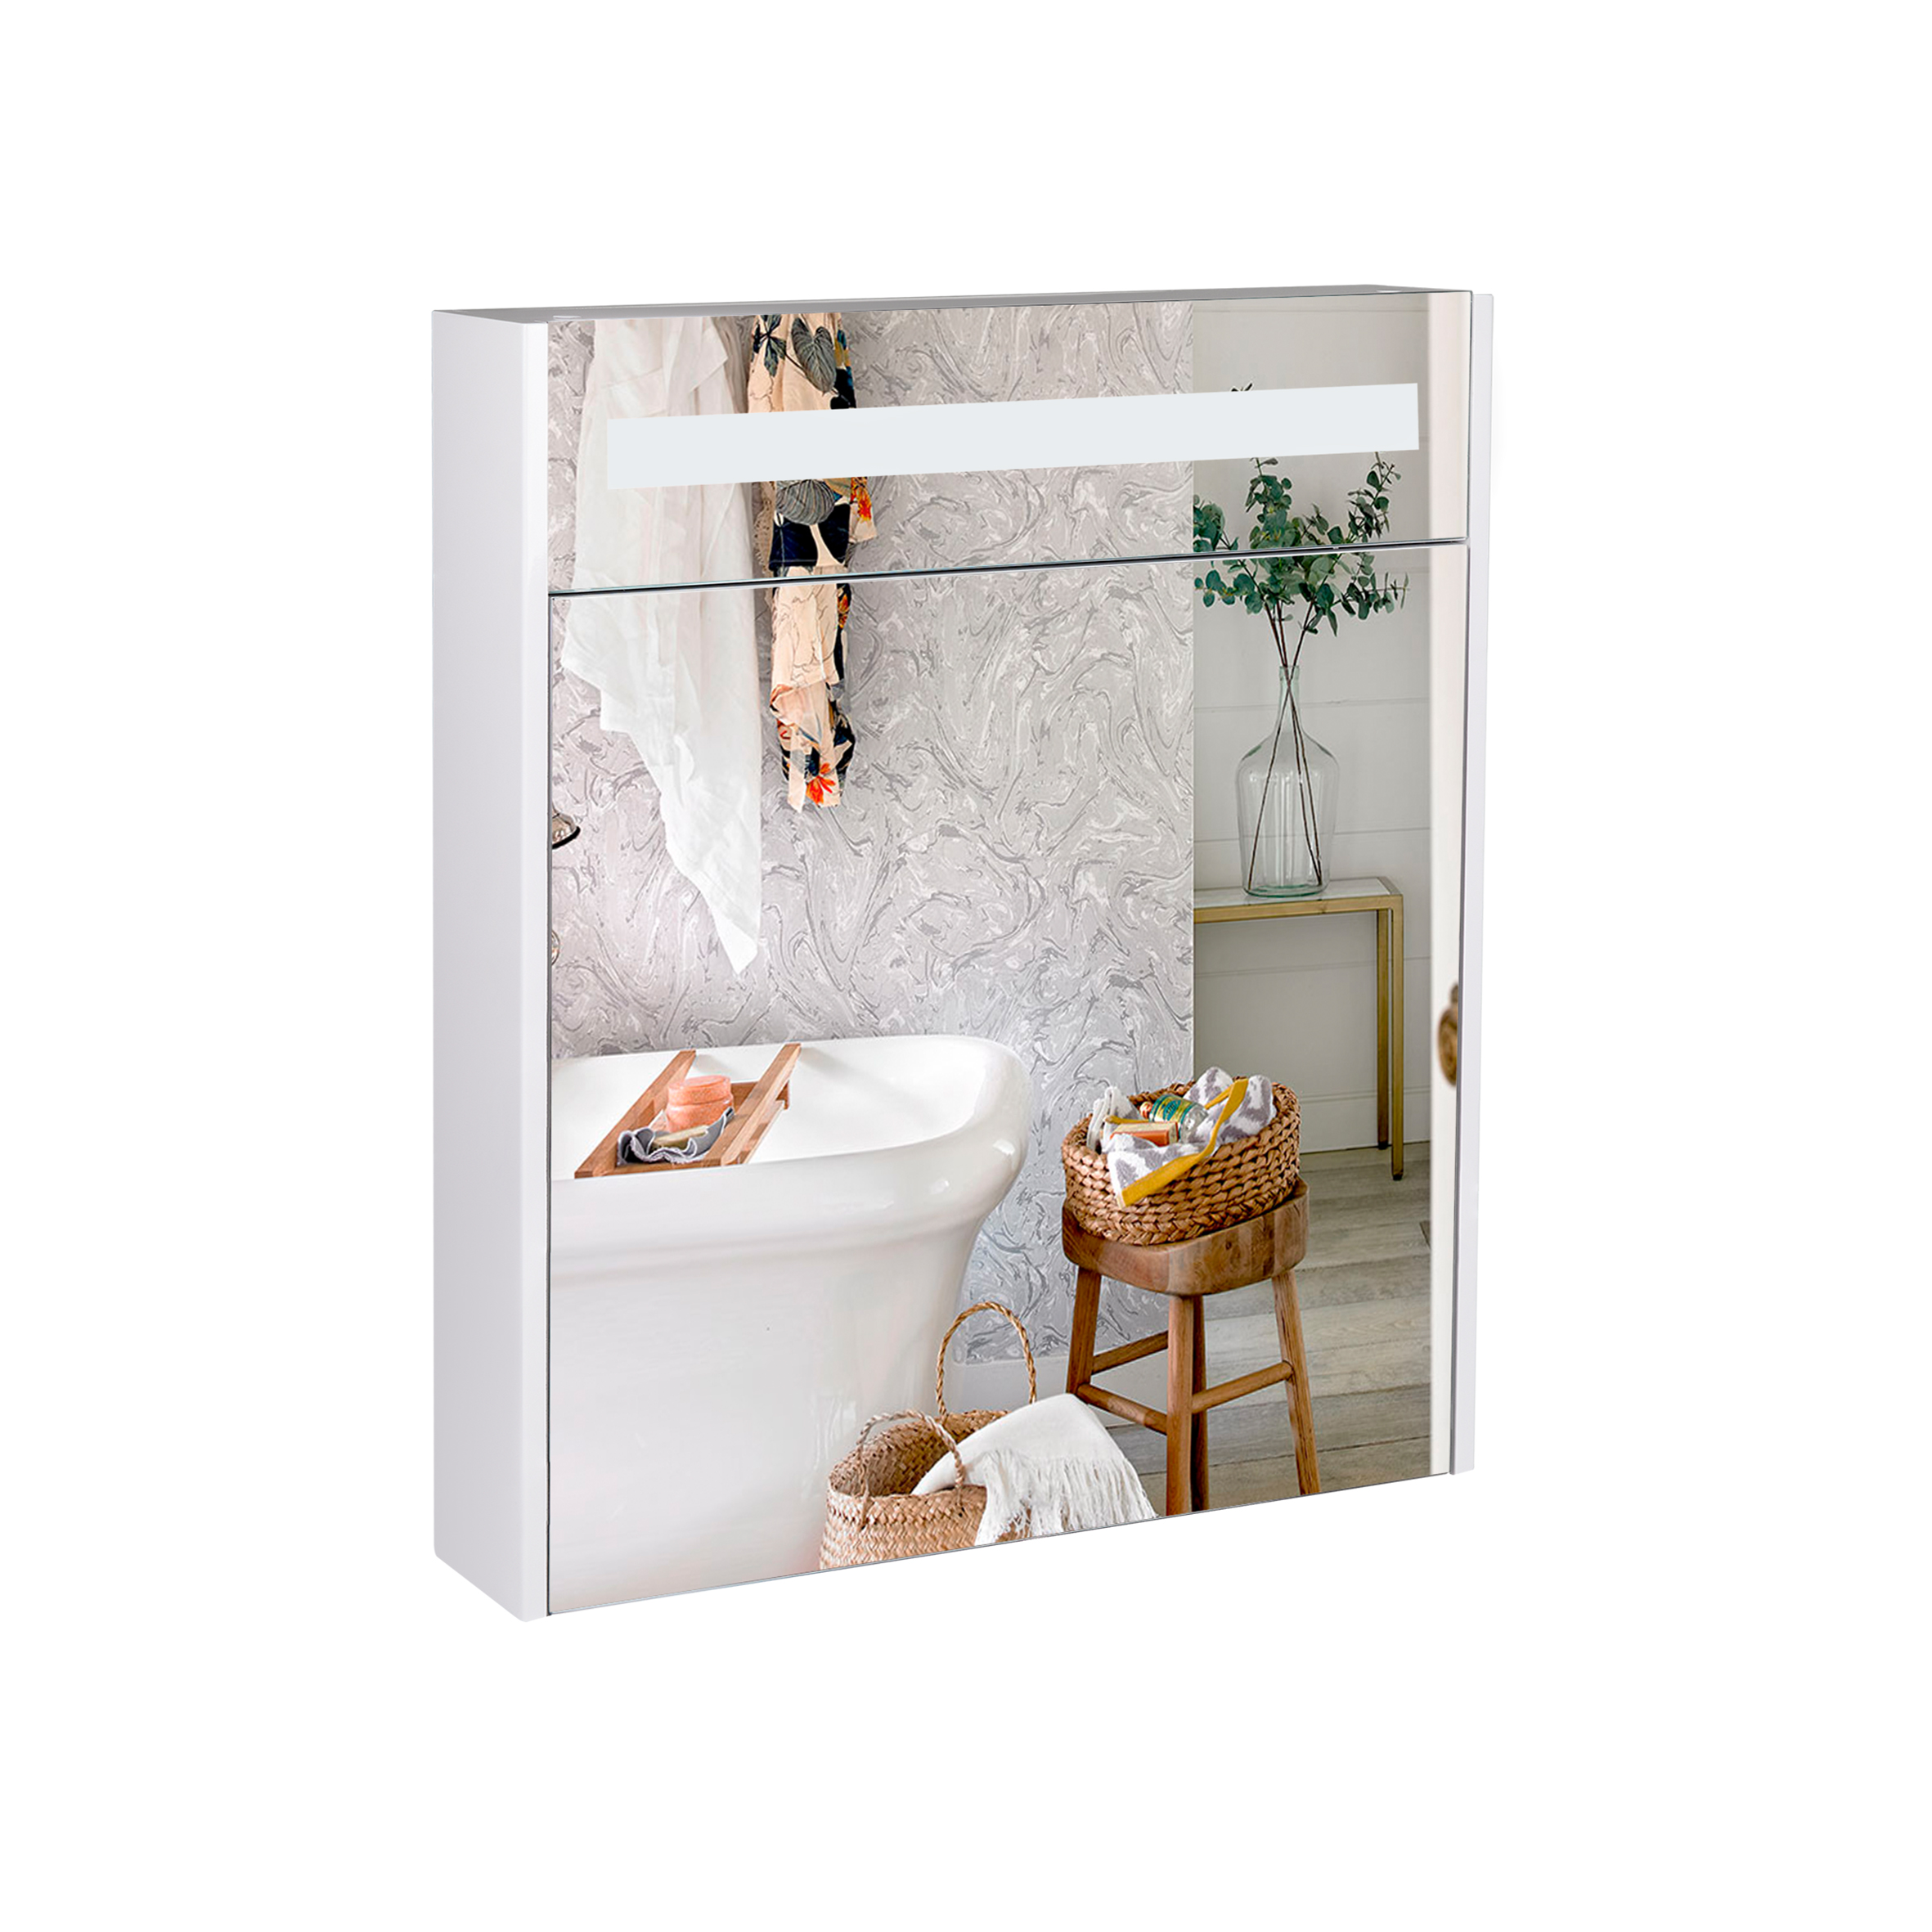 Зеркальный шкаф подвесной Qtap Robin 600х730х145 White с LED-подсветкой QT1377ZP6001W